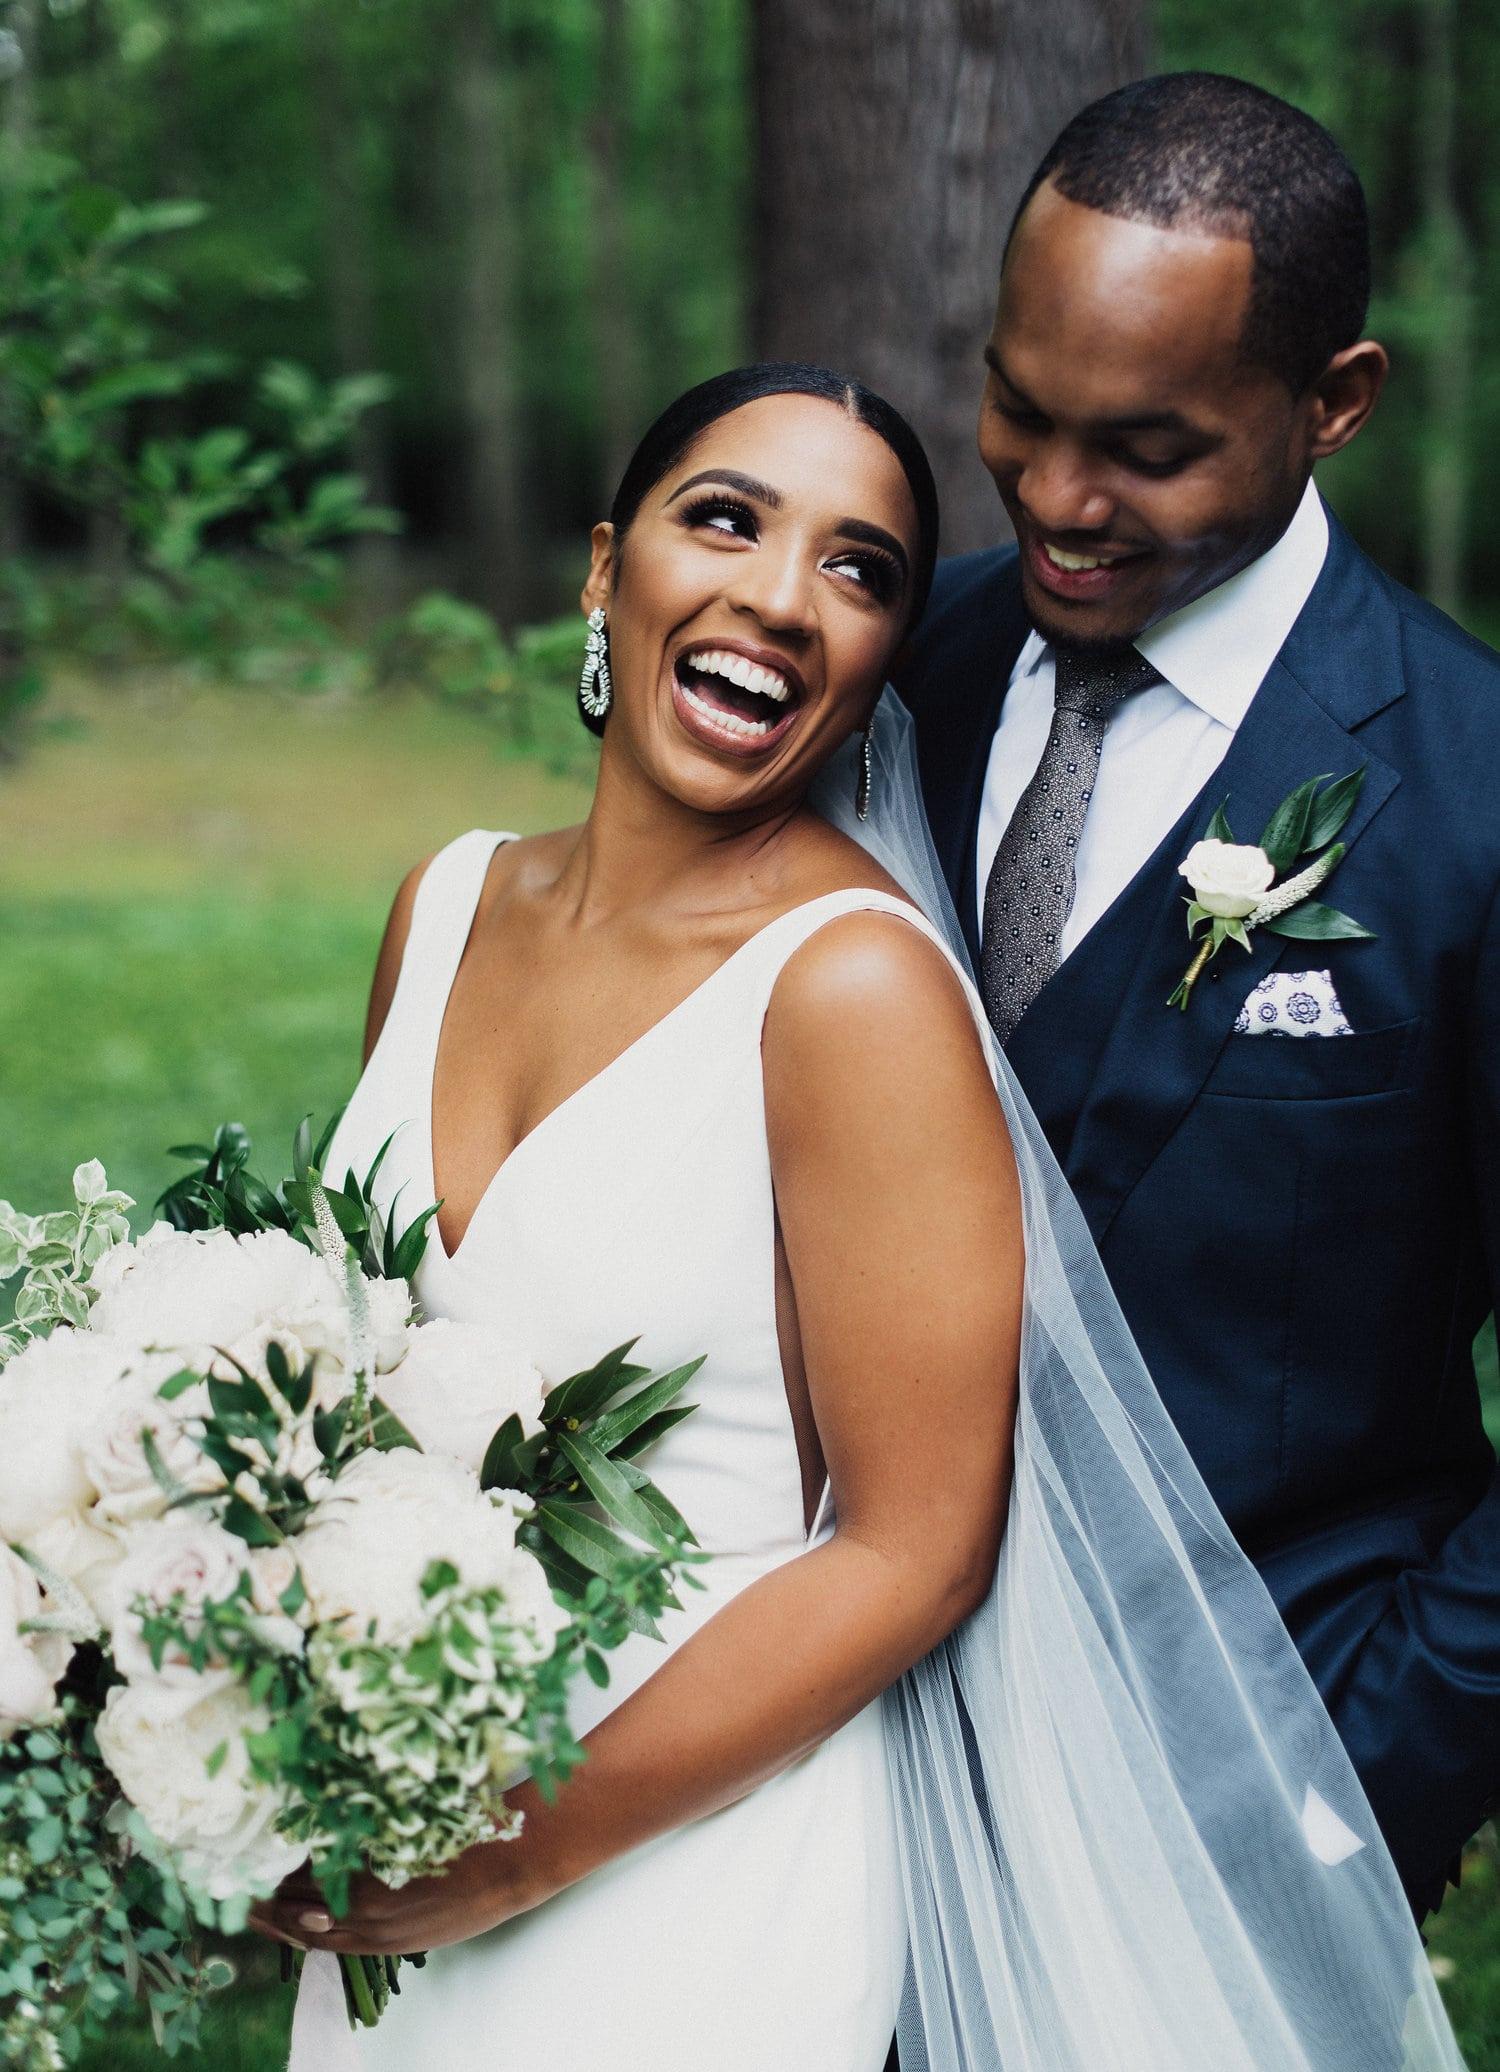 haynes-wedding-edenstraderphoto-172-min.jpg